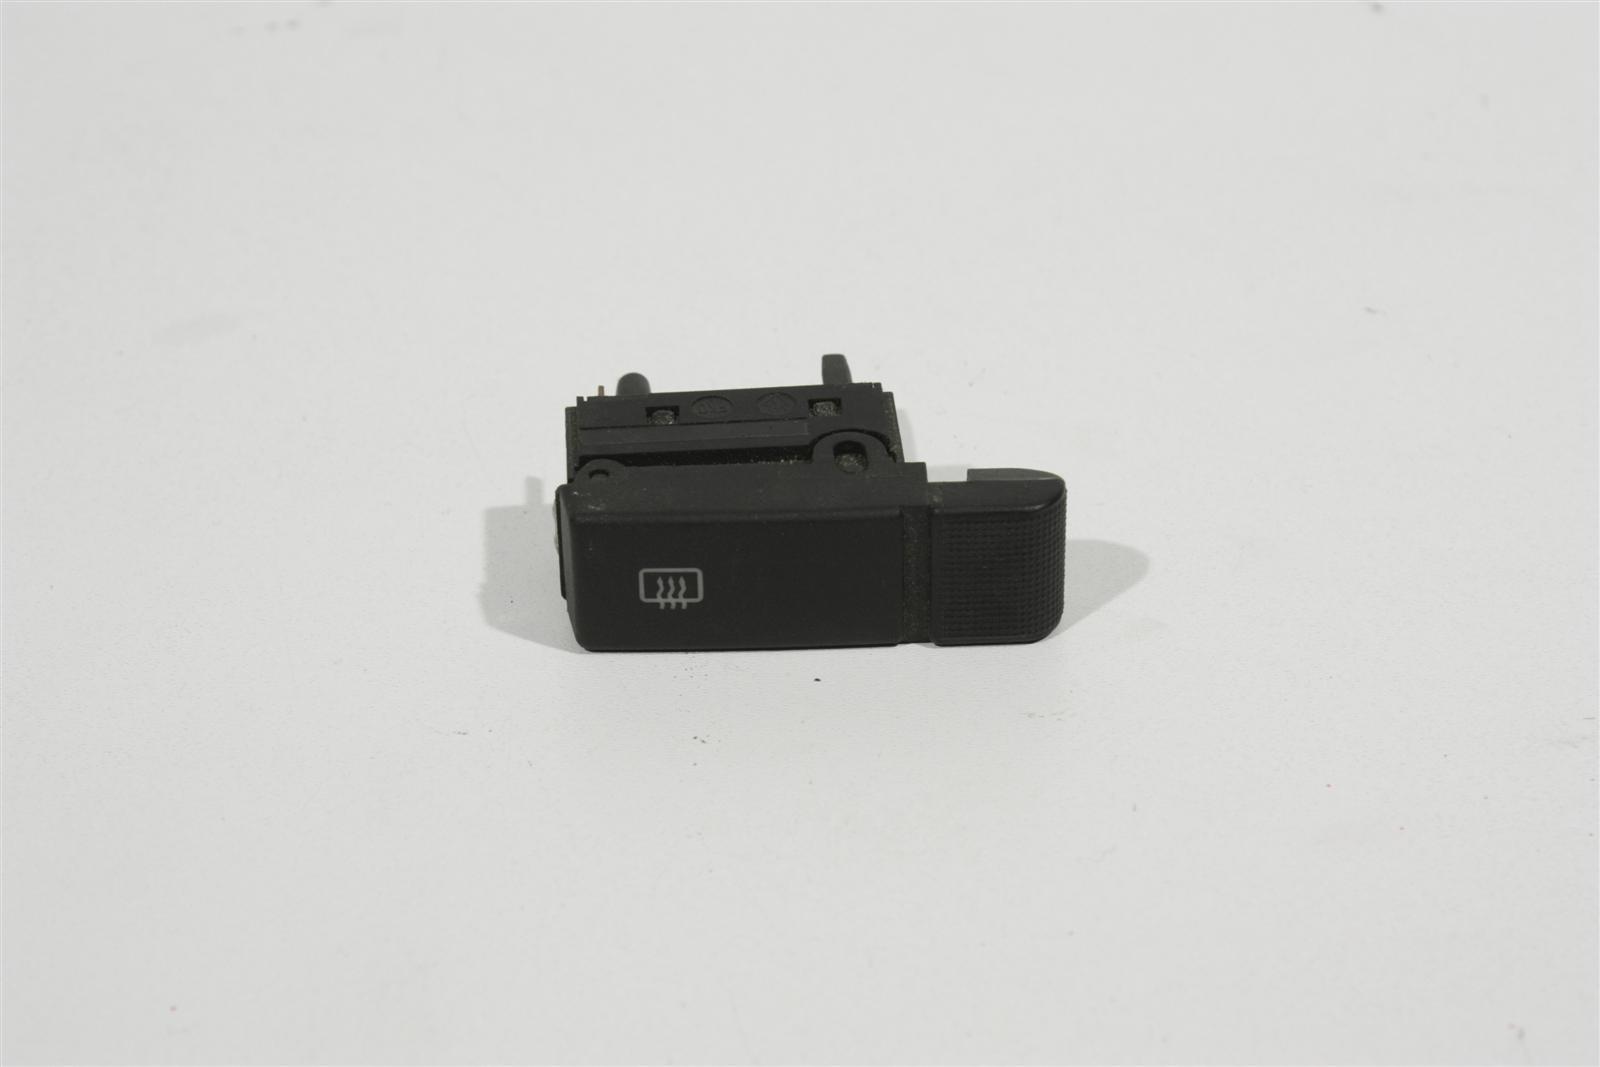 Audi 80/90 Typ 81/85 Schalter Heckscheibenheizung 857941503B